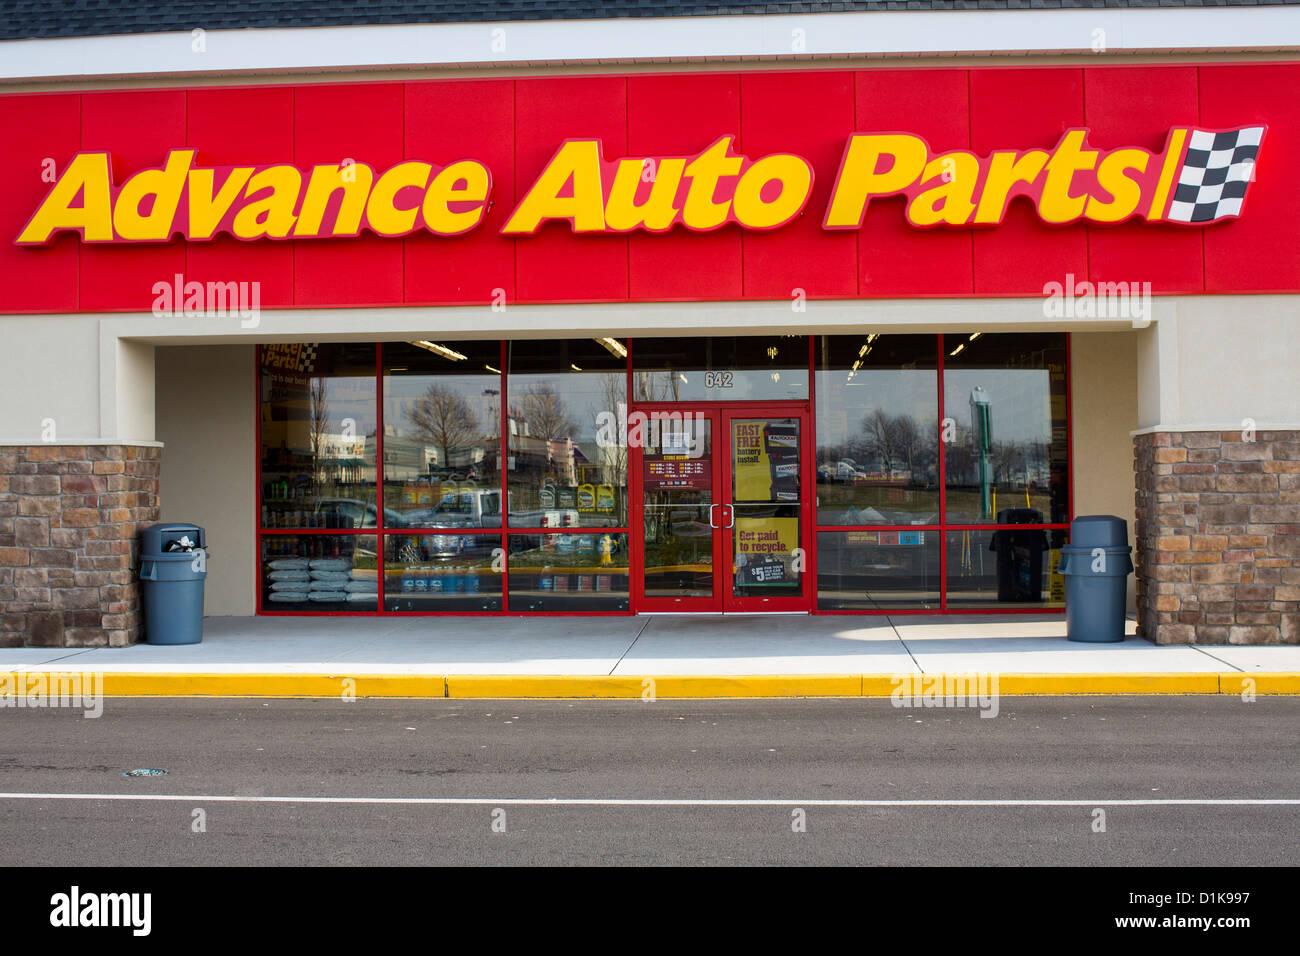 An Advance Auto Parts retail store.  - Stock Image